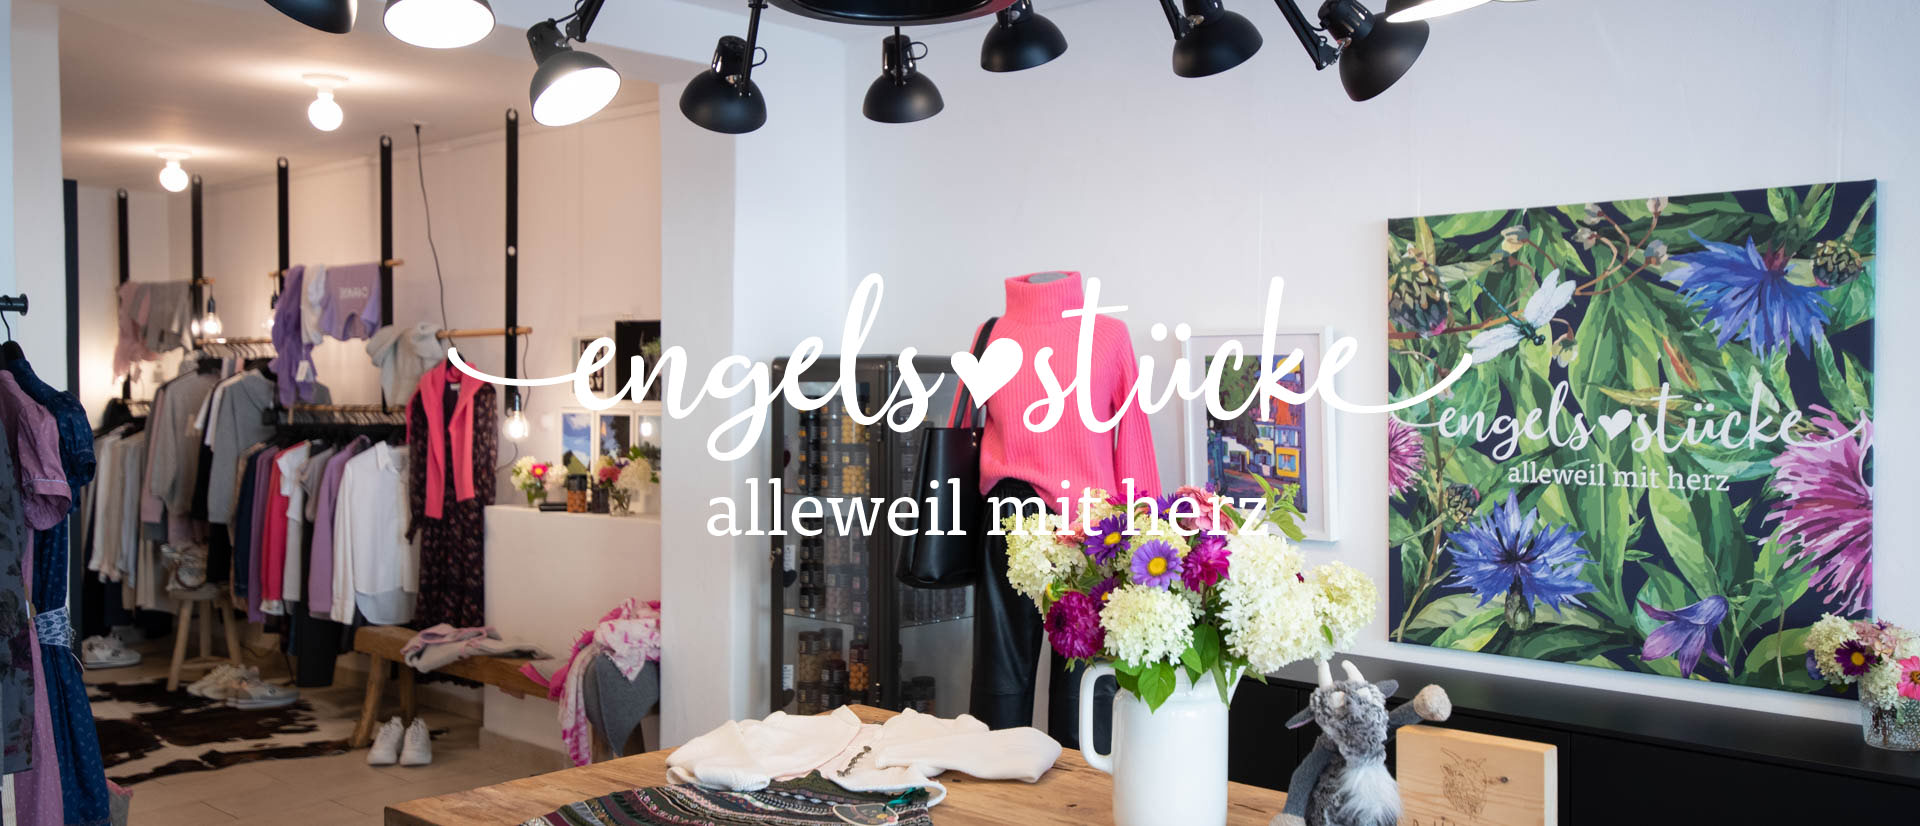 engelsstücke_Website_Header_Herbst_2021